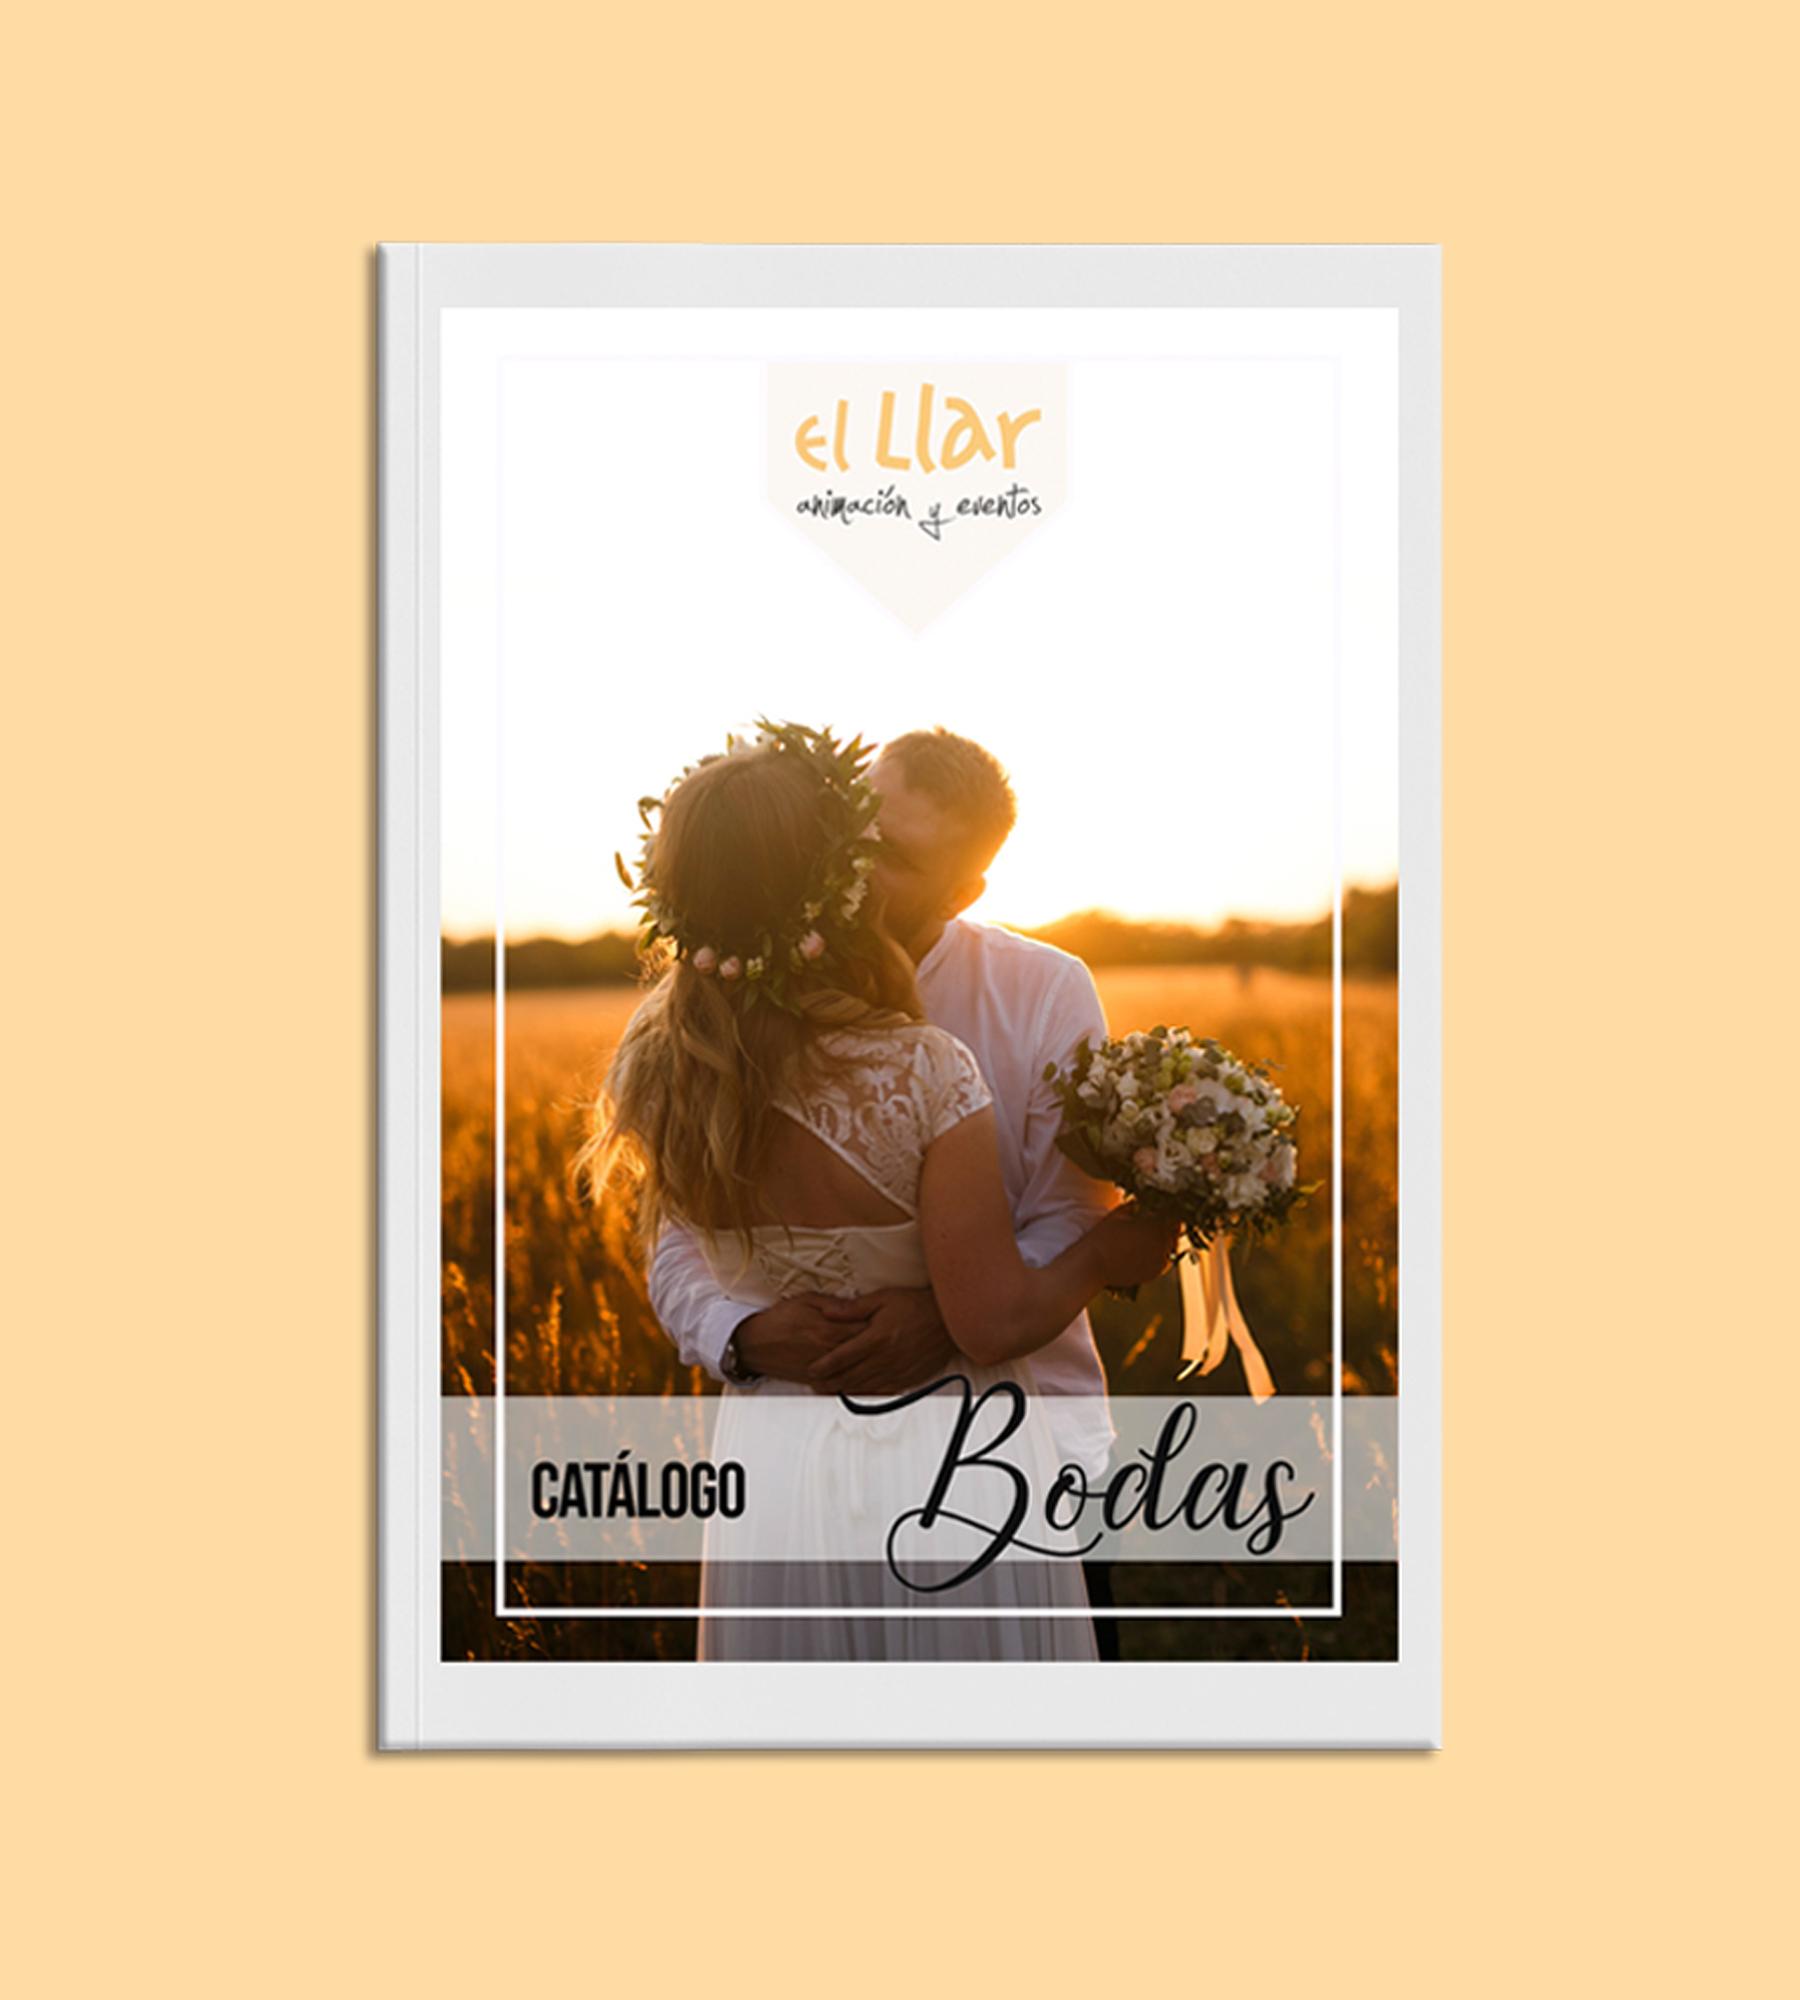 catalogo bodas el llar 1800X1000PX